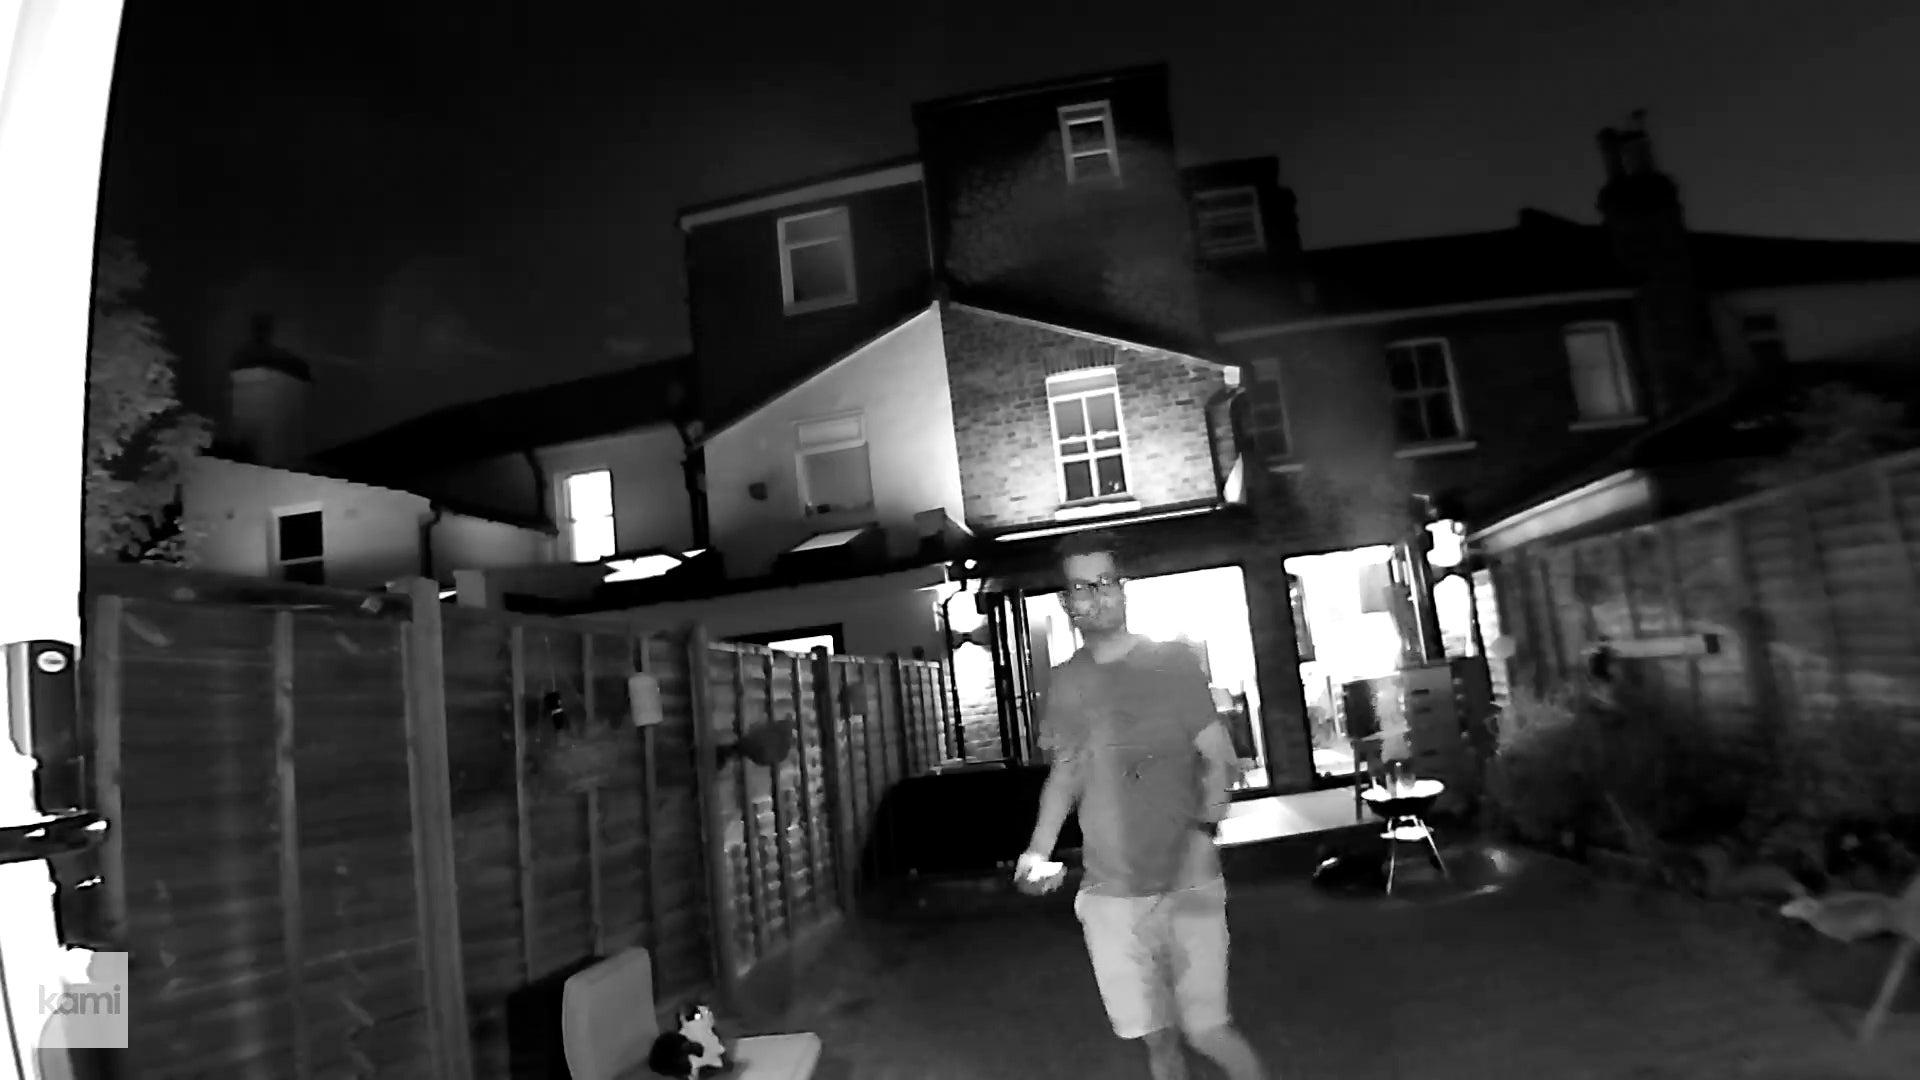 Kami Wire-Free Outdoor Camera night sample